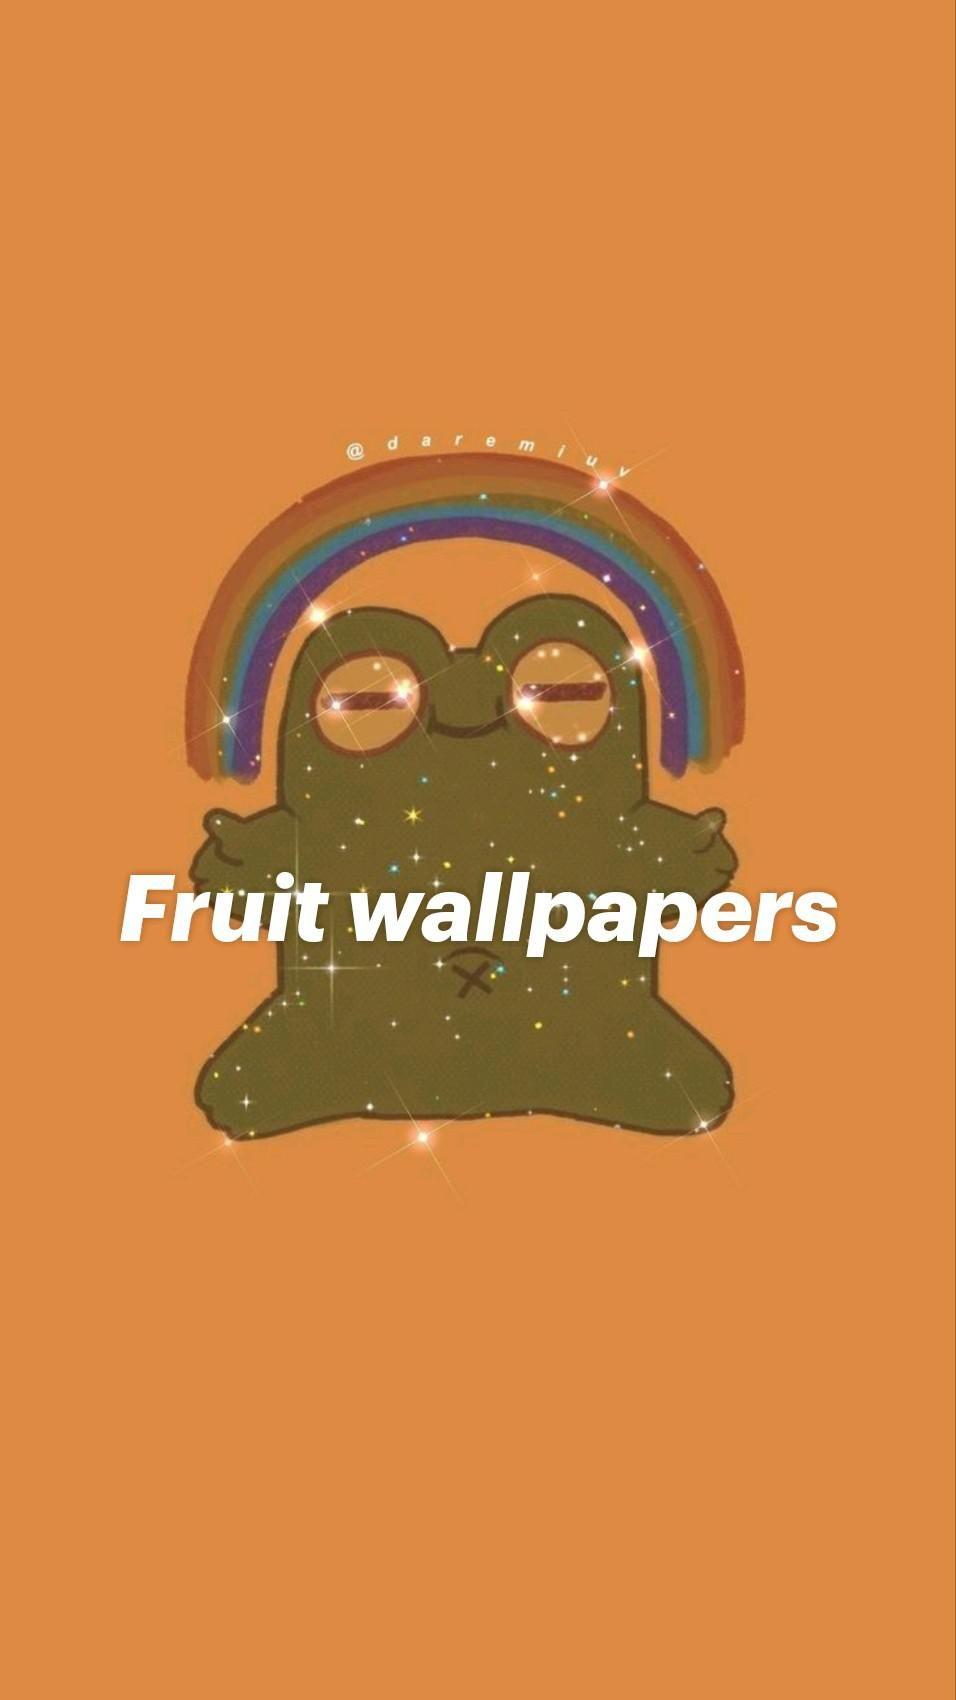 Fruit wallpapers